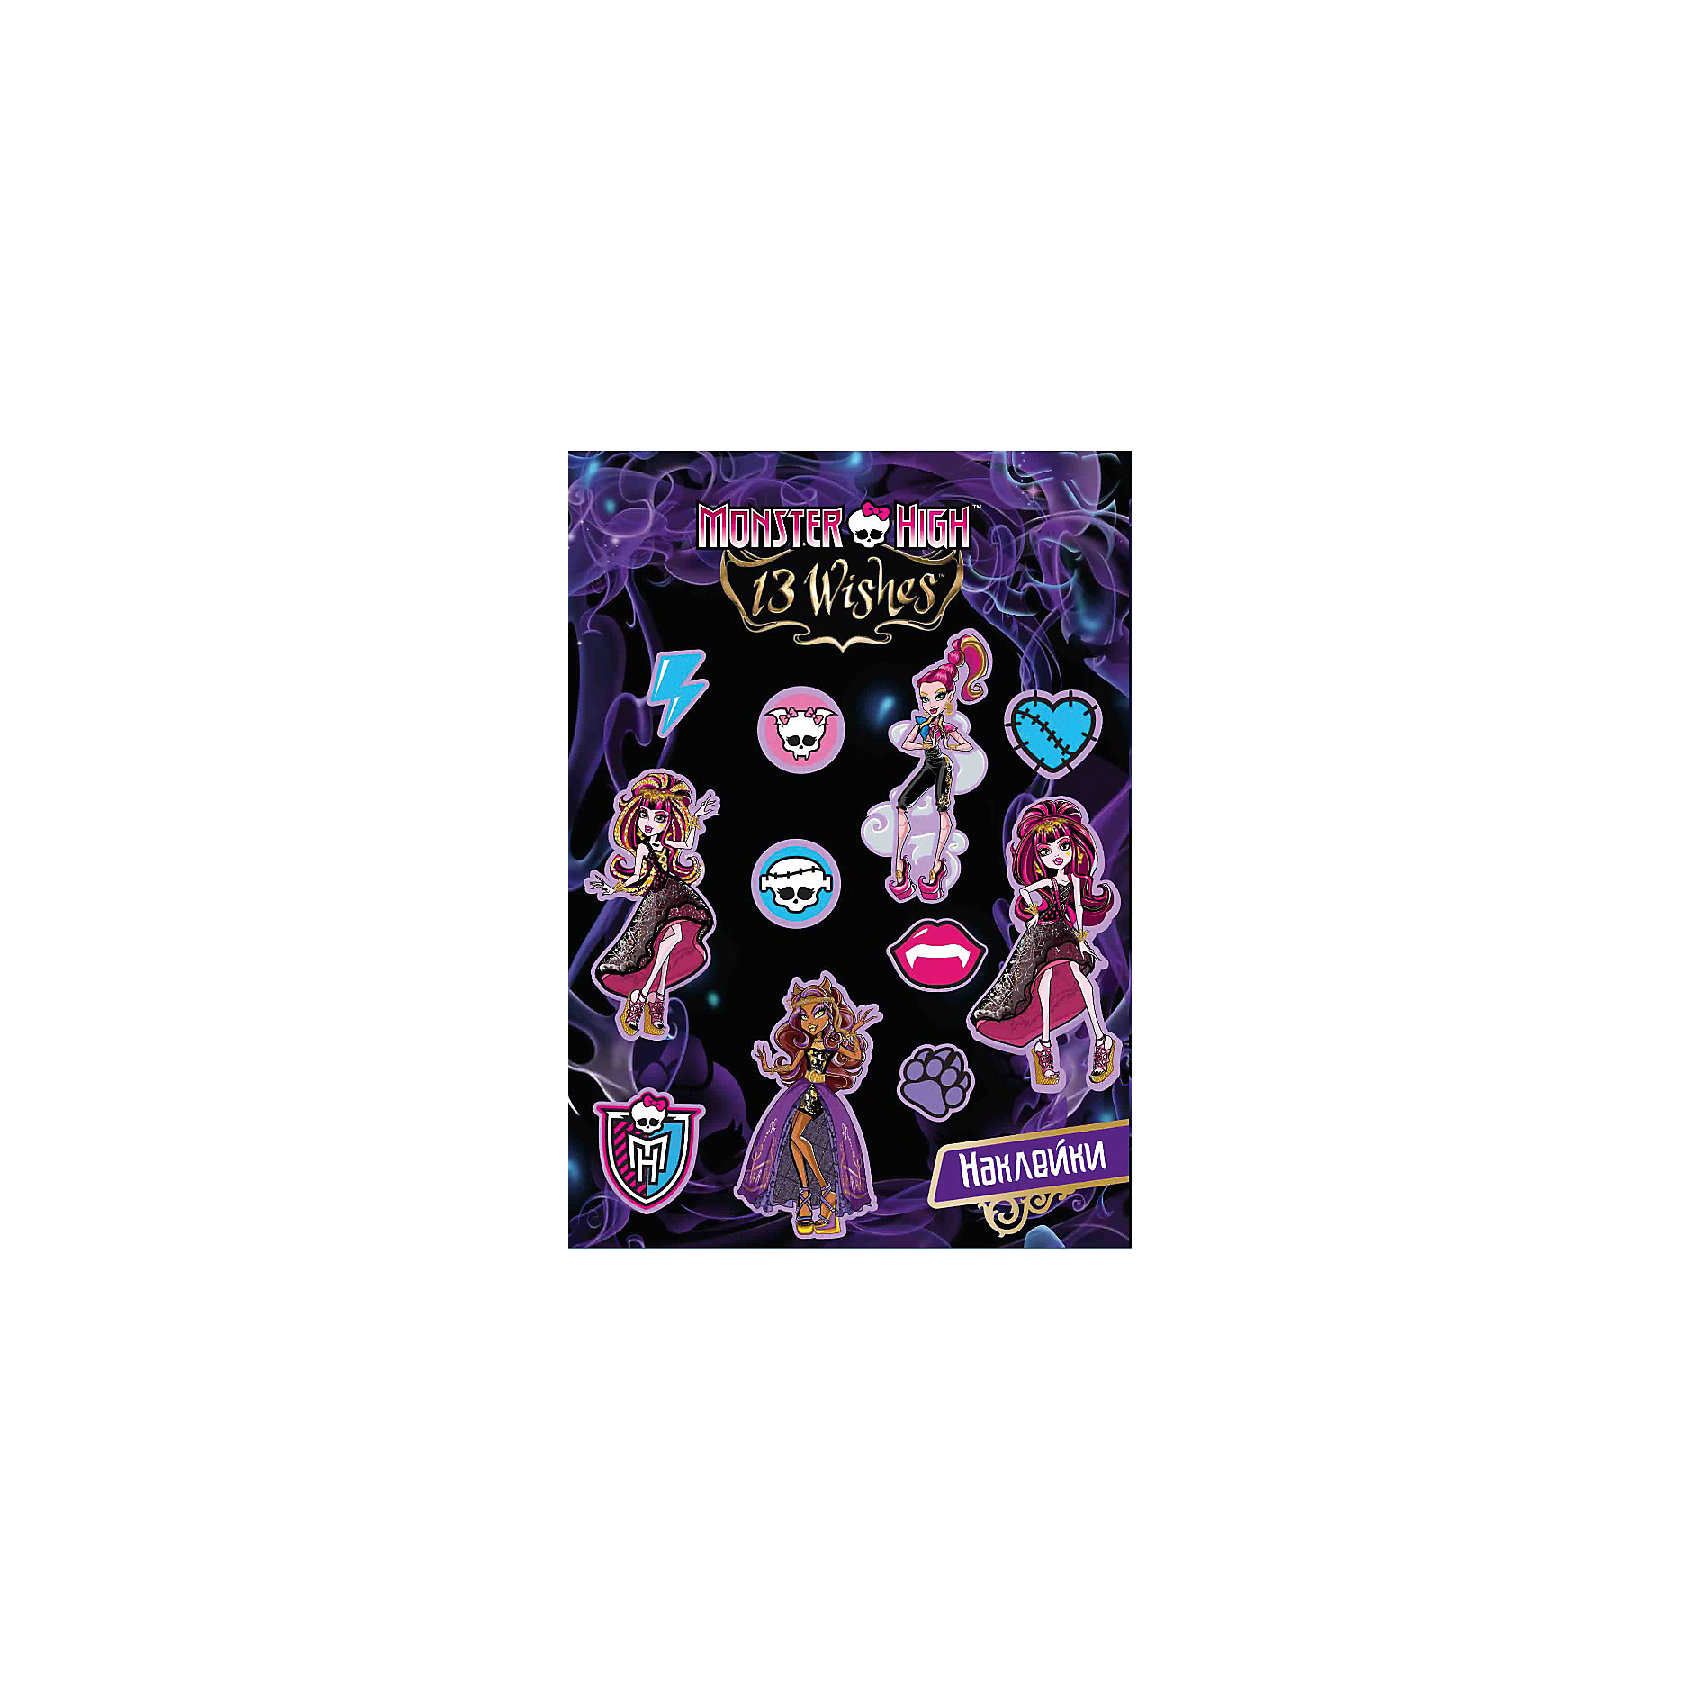 CENTRUM Наклейки для тетрадей 13 желаний, Monster High росмэн наклейки 2 monster high